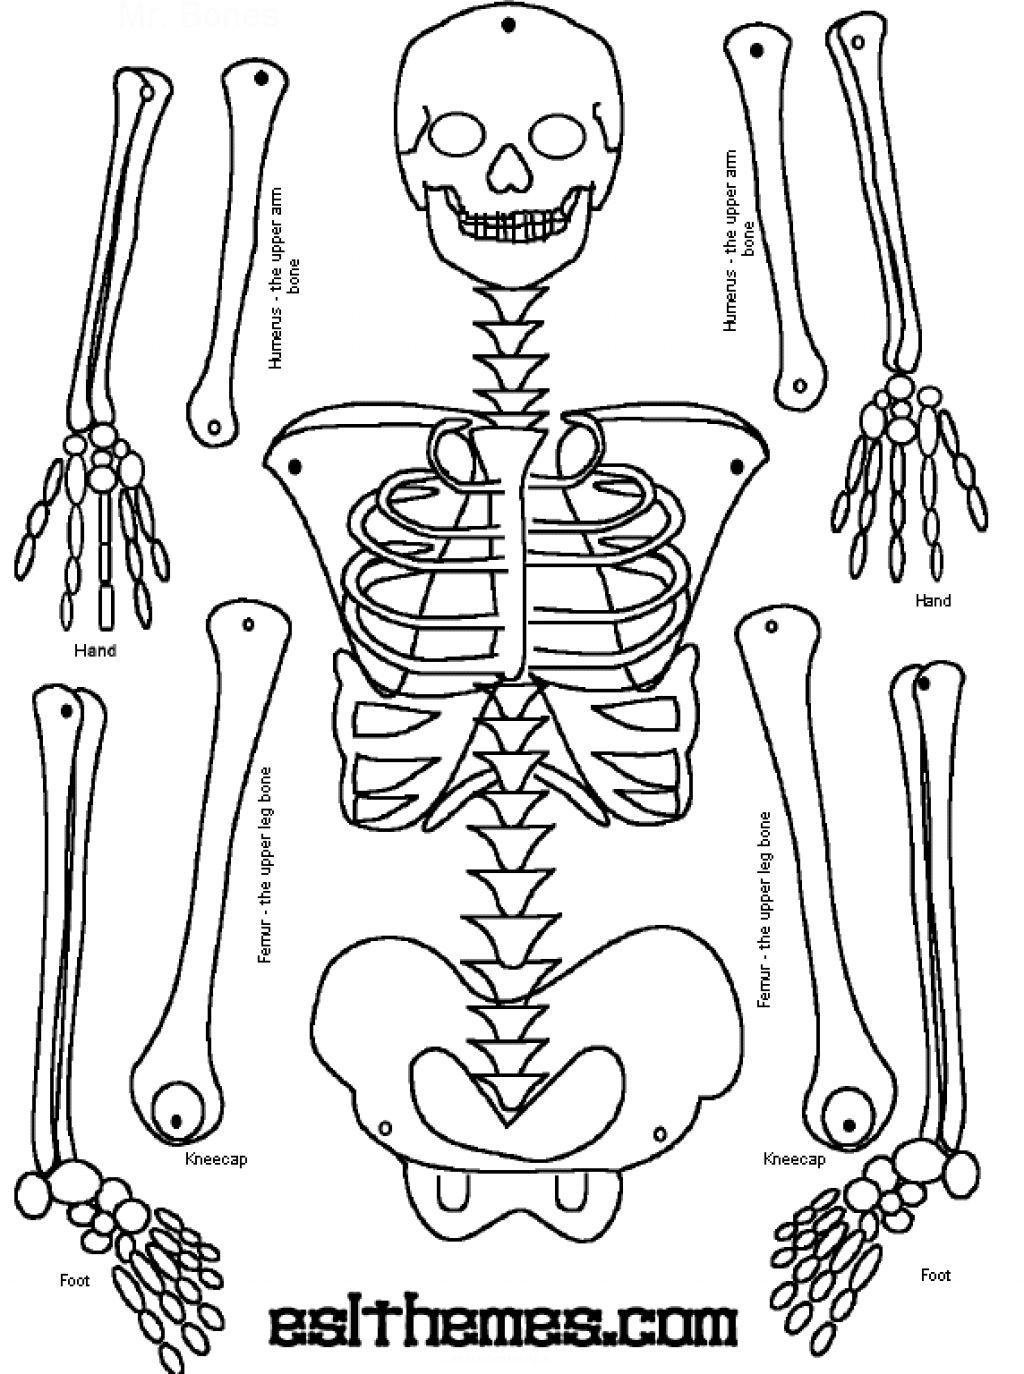 Skeleton Puzzle Printable | Print It | Human Skeleton, Human Body - Printable Skeleton Puzzle